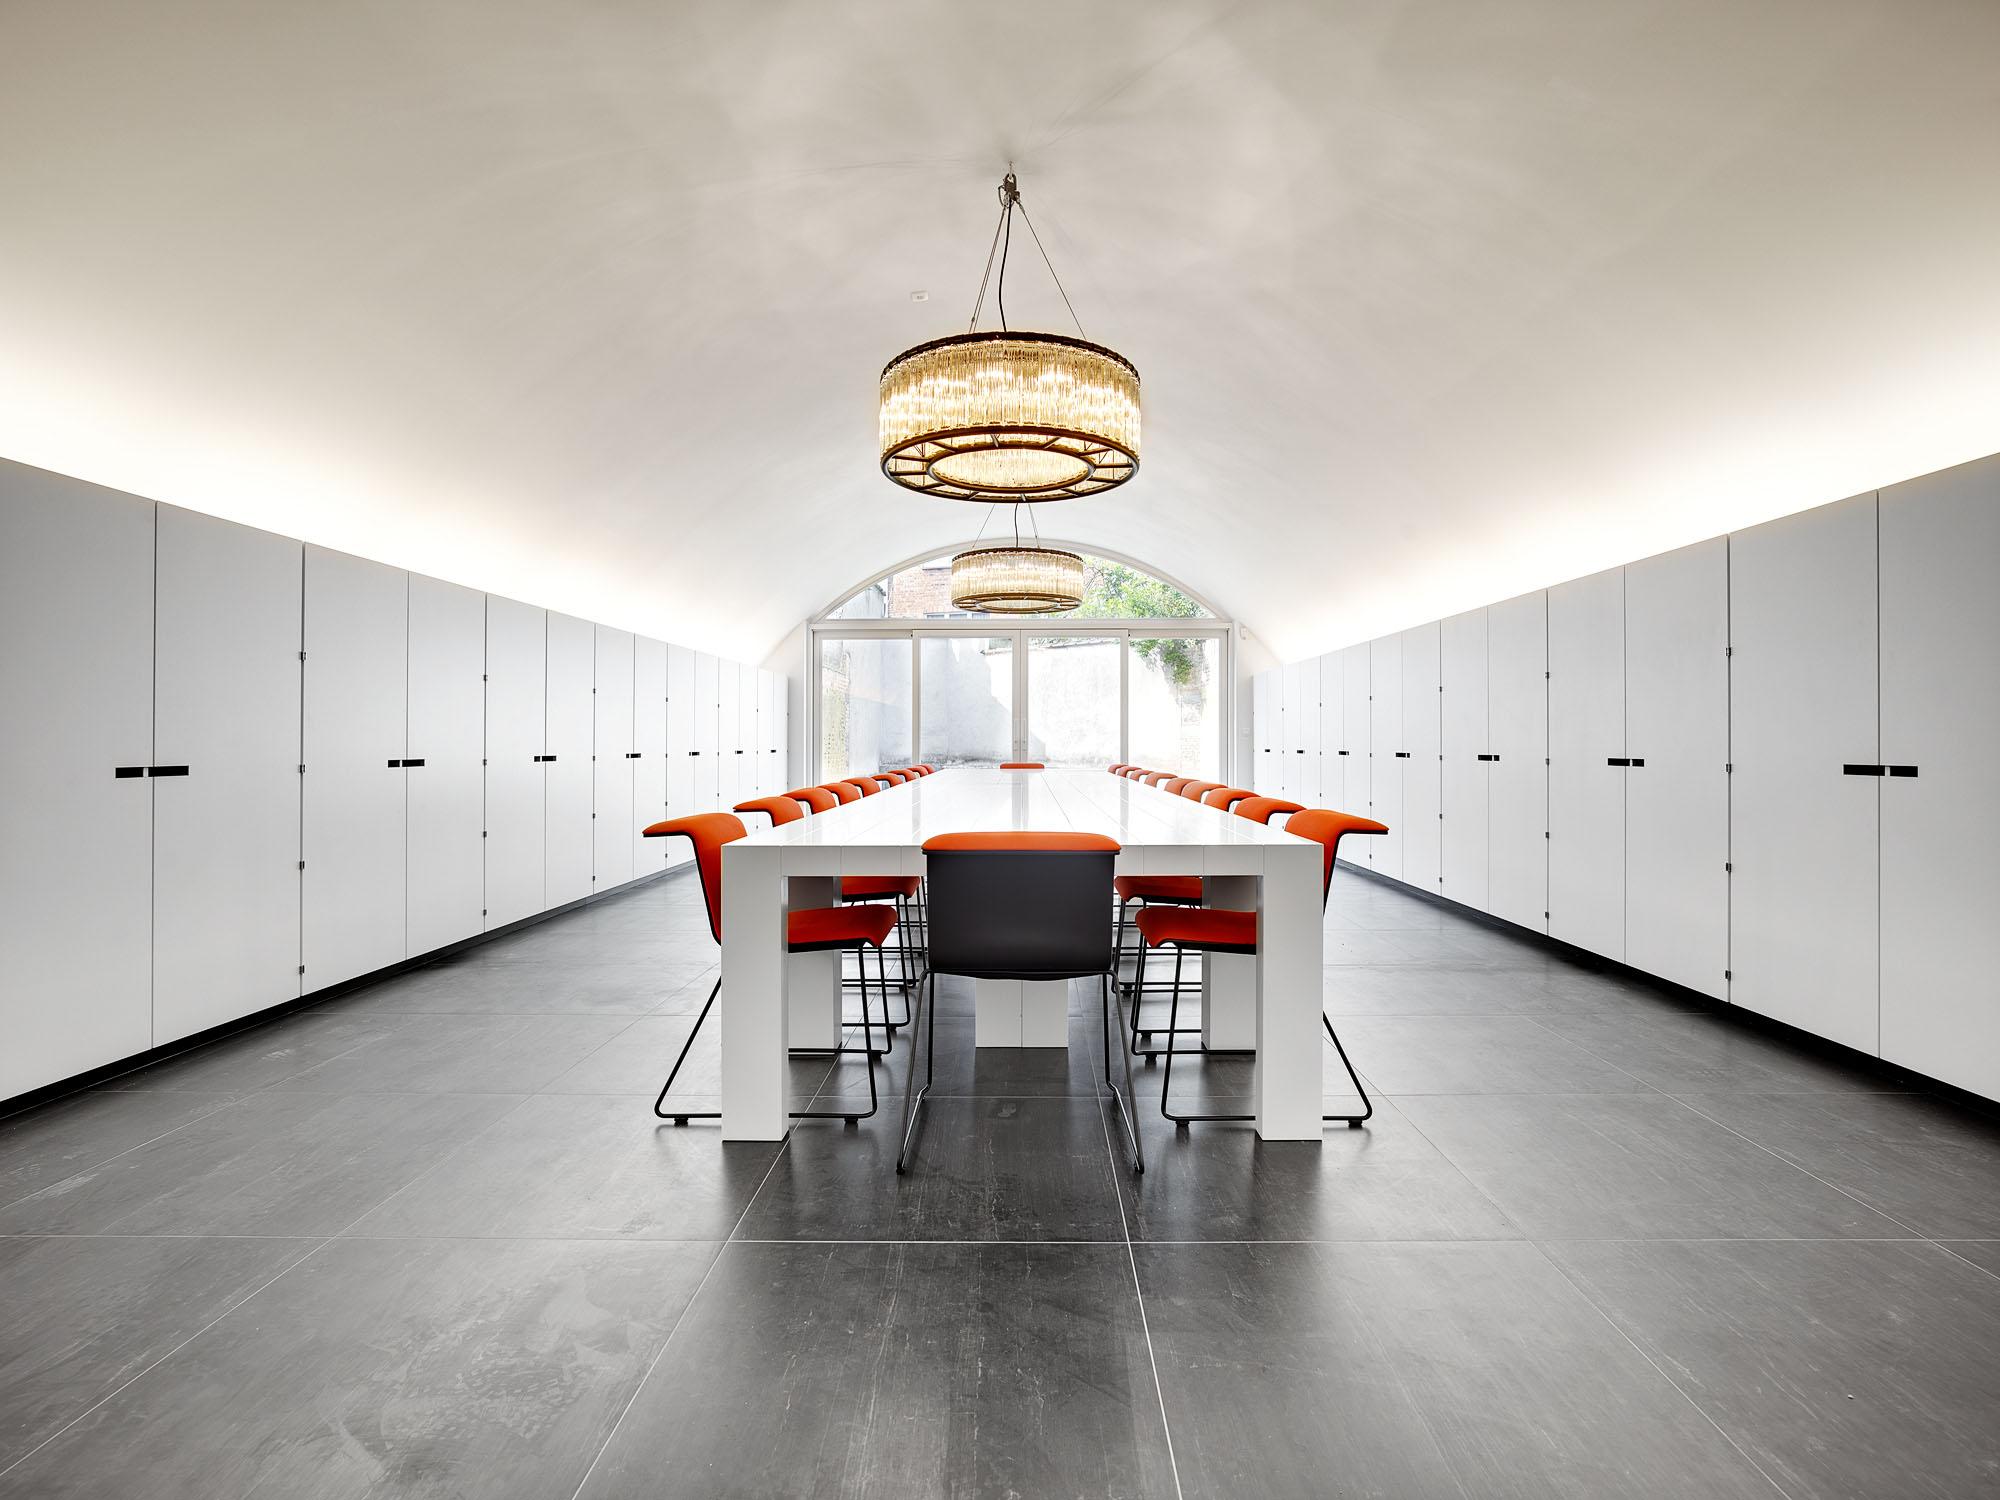 Lowette & partners architects cvba - Duurzame renovatie